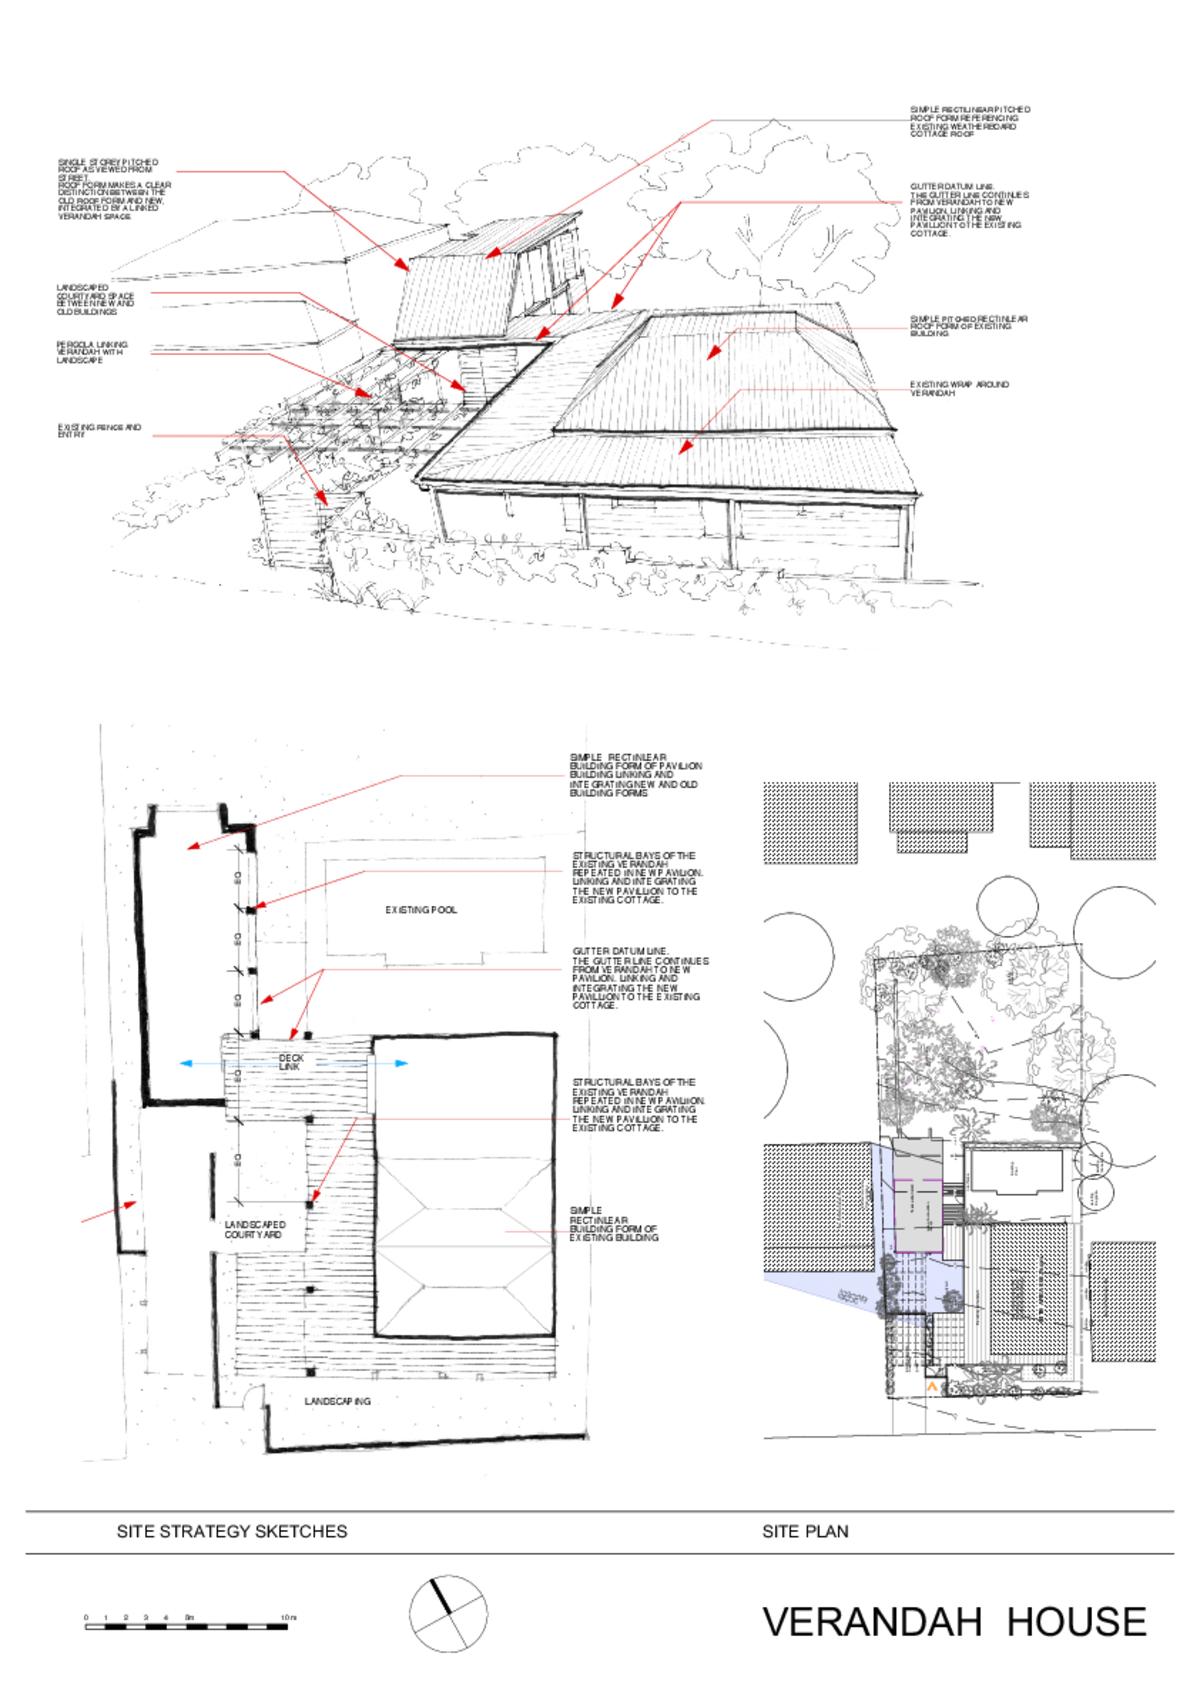 hight resolution of gallery of verandah house by still space architecture local australia residential bespoke design putney sydney